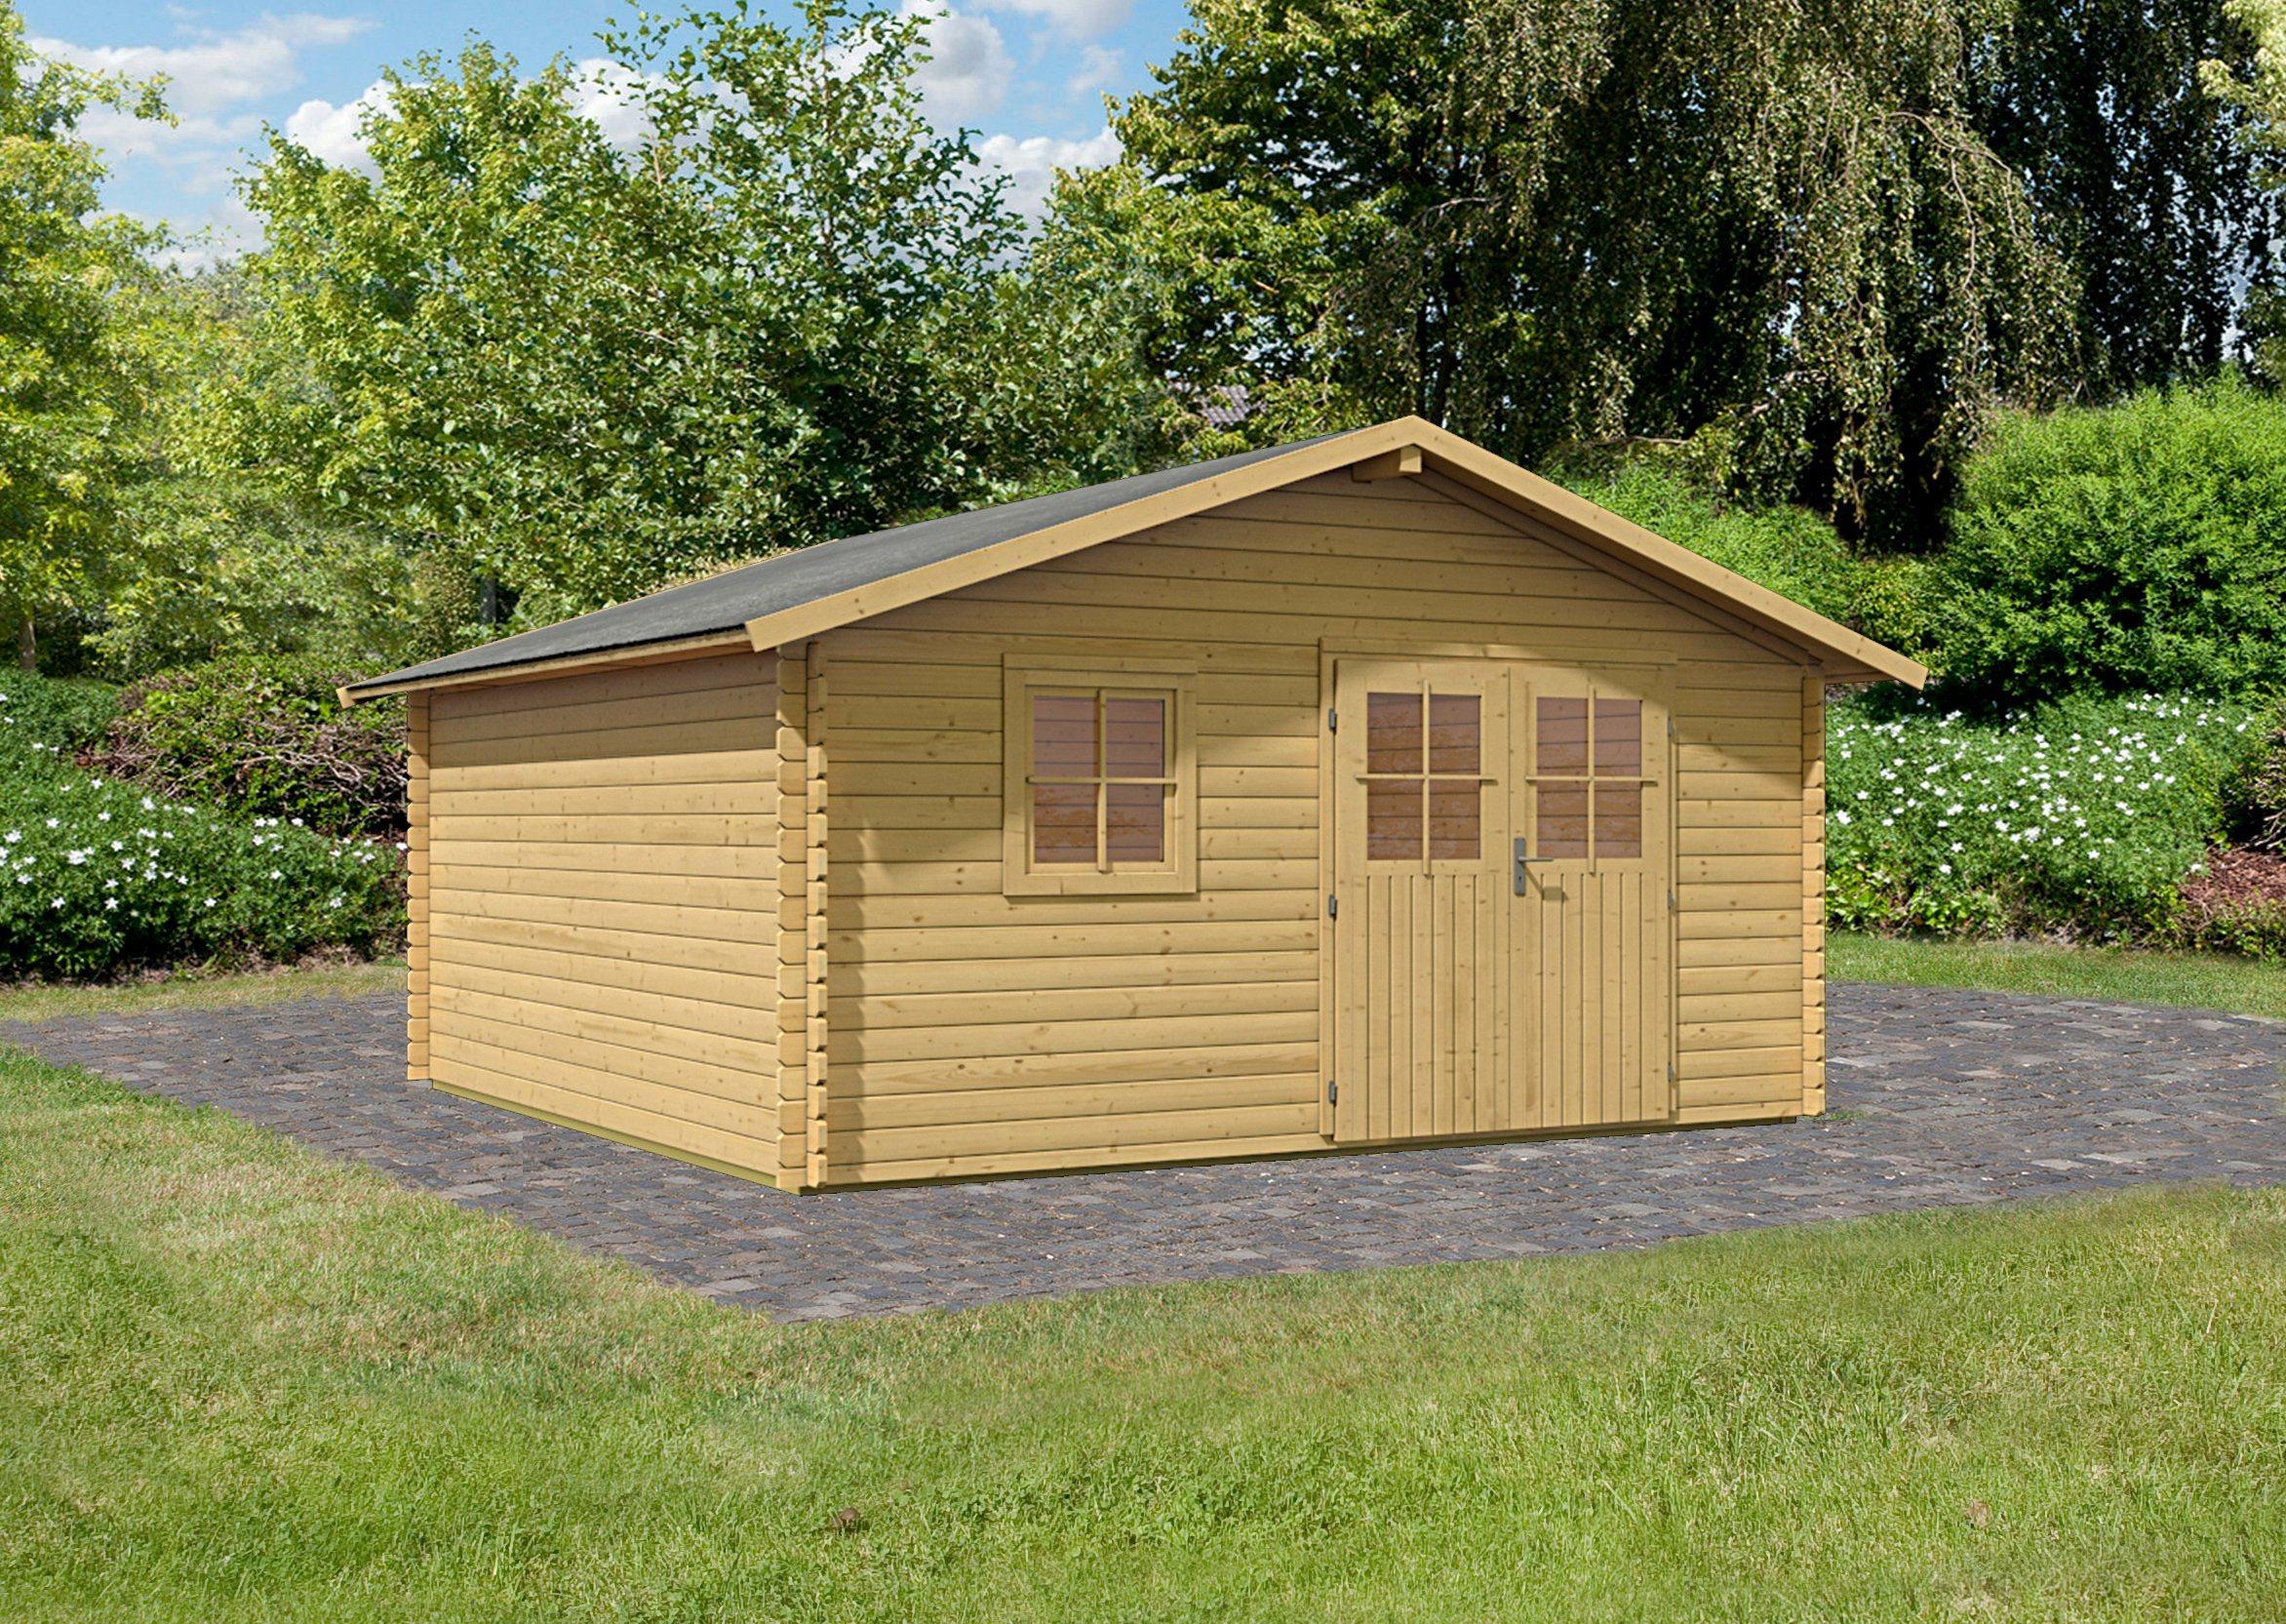 KARIBU Gartenhaus »Traventhal 2«, BxT: 452x452 cm | Garten > Gartenhäuser | Karibu